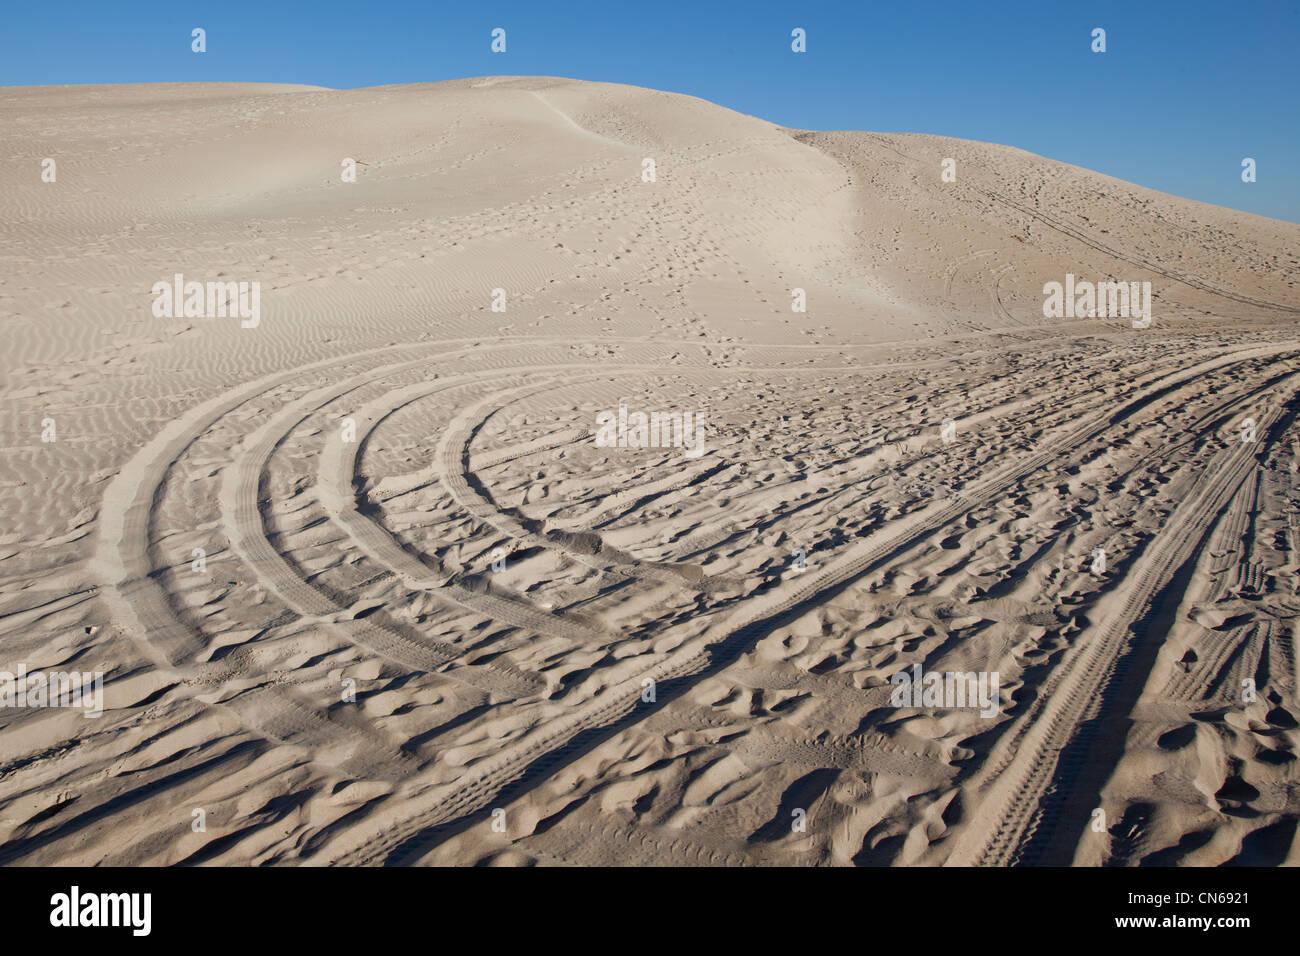 Tire marks over sand Eyre Peninsula South Australia - Stock Image